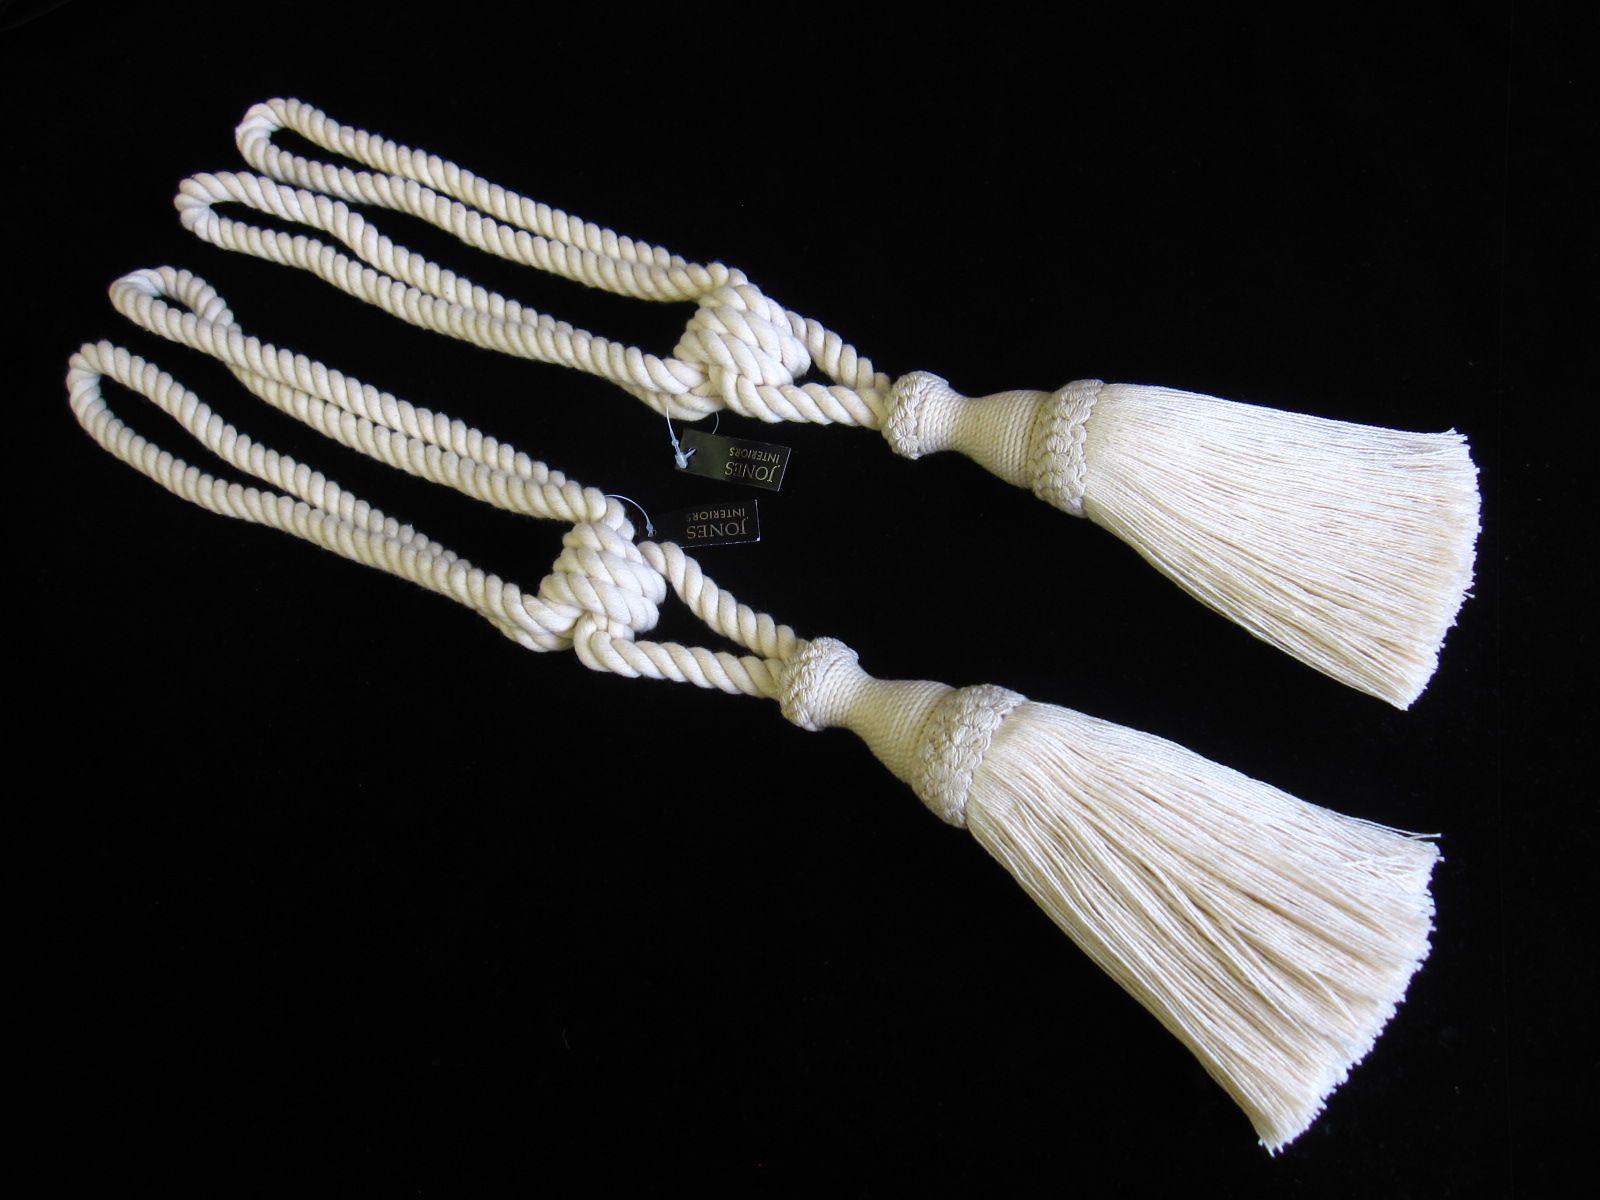 2 Natural Cotton Curtain Tiebacks Jones Interiors Cream Tie Backs Ropes Ties